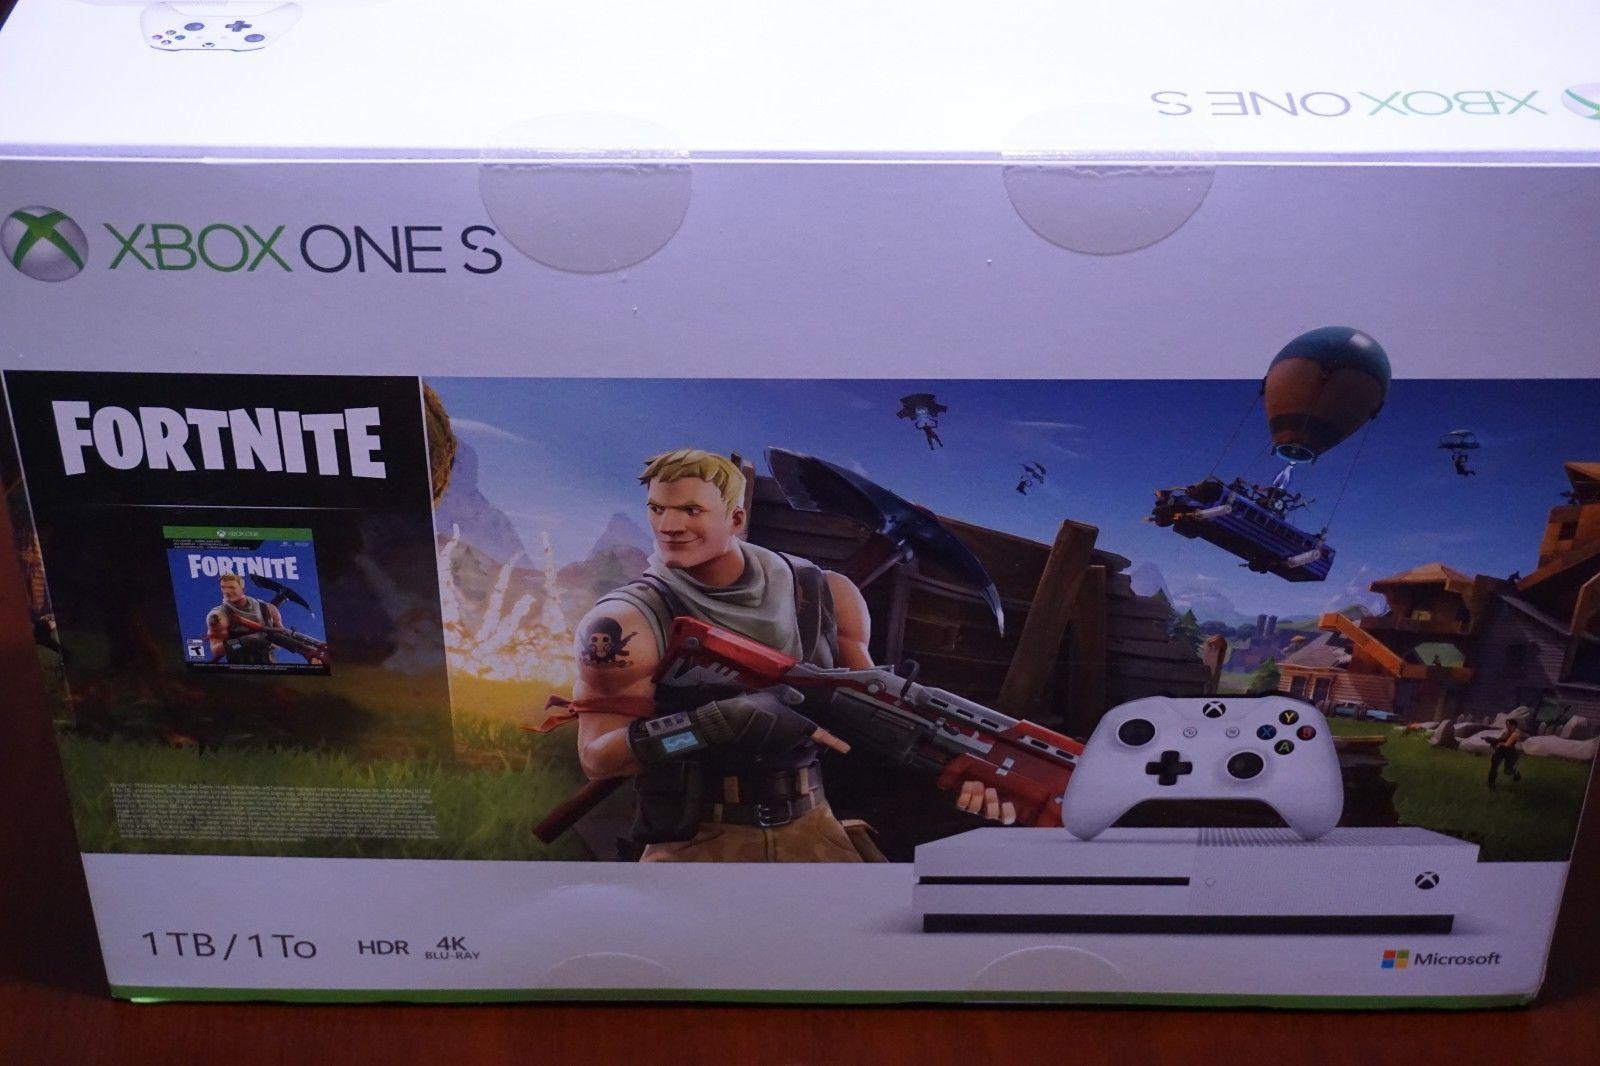 Xbox One S 1tb Fortnite Bundle Full Game Battle Royale 2000 V Bucks Eon Costume We Sell Fortnite Accounts And Loot Crates Ch Xbox One S 1tb Xbox One Xbox One S